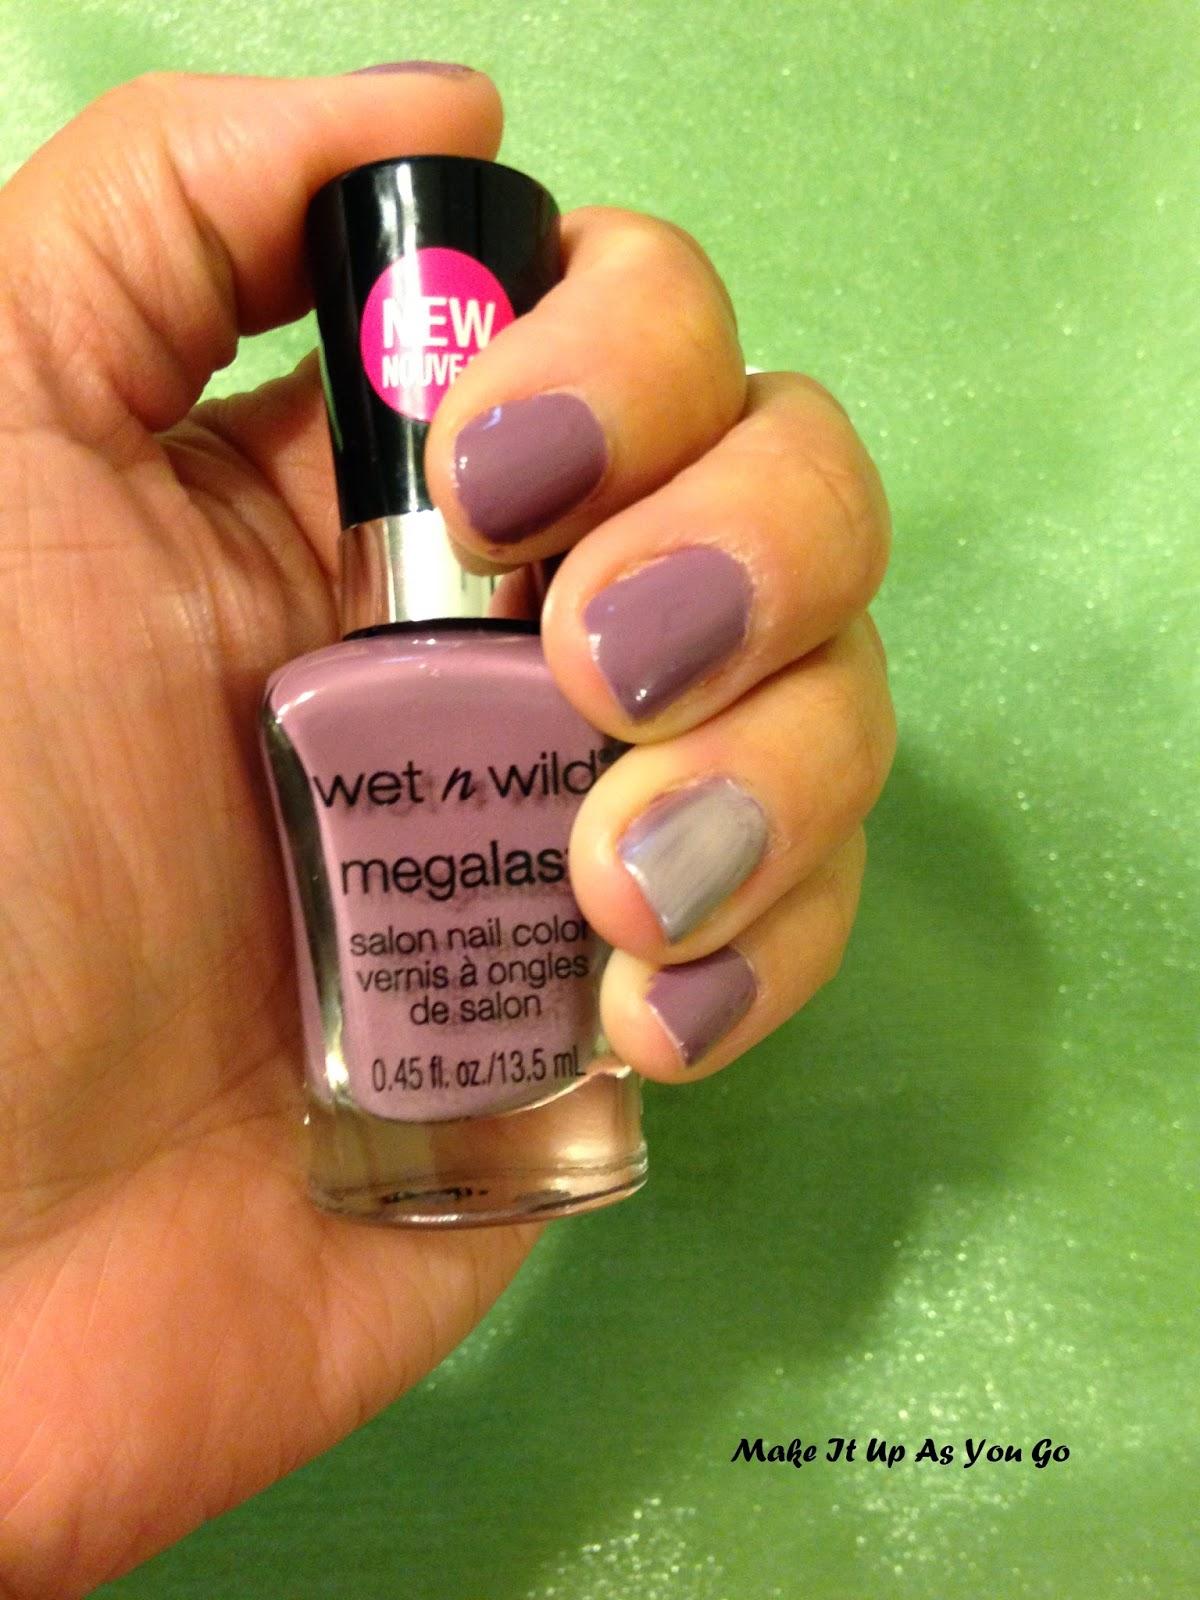 Make It Up As You Go: Nail Polish Change - Wet n Wild Megalast Salon ...